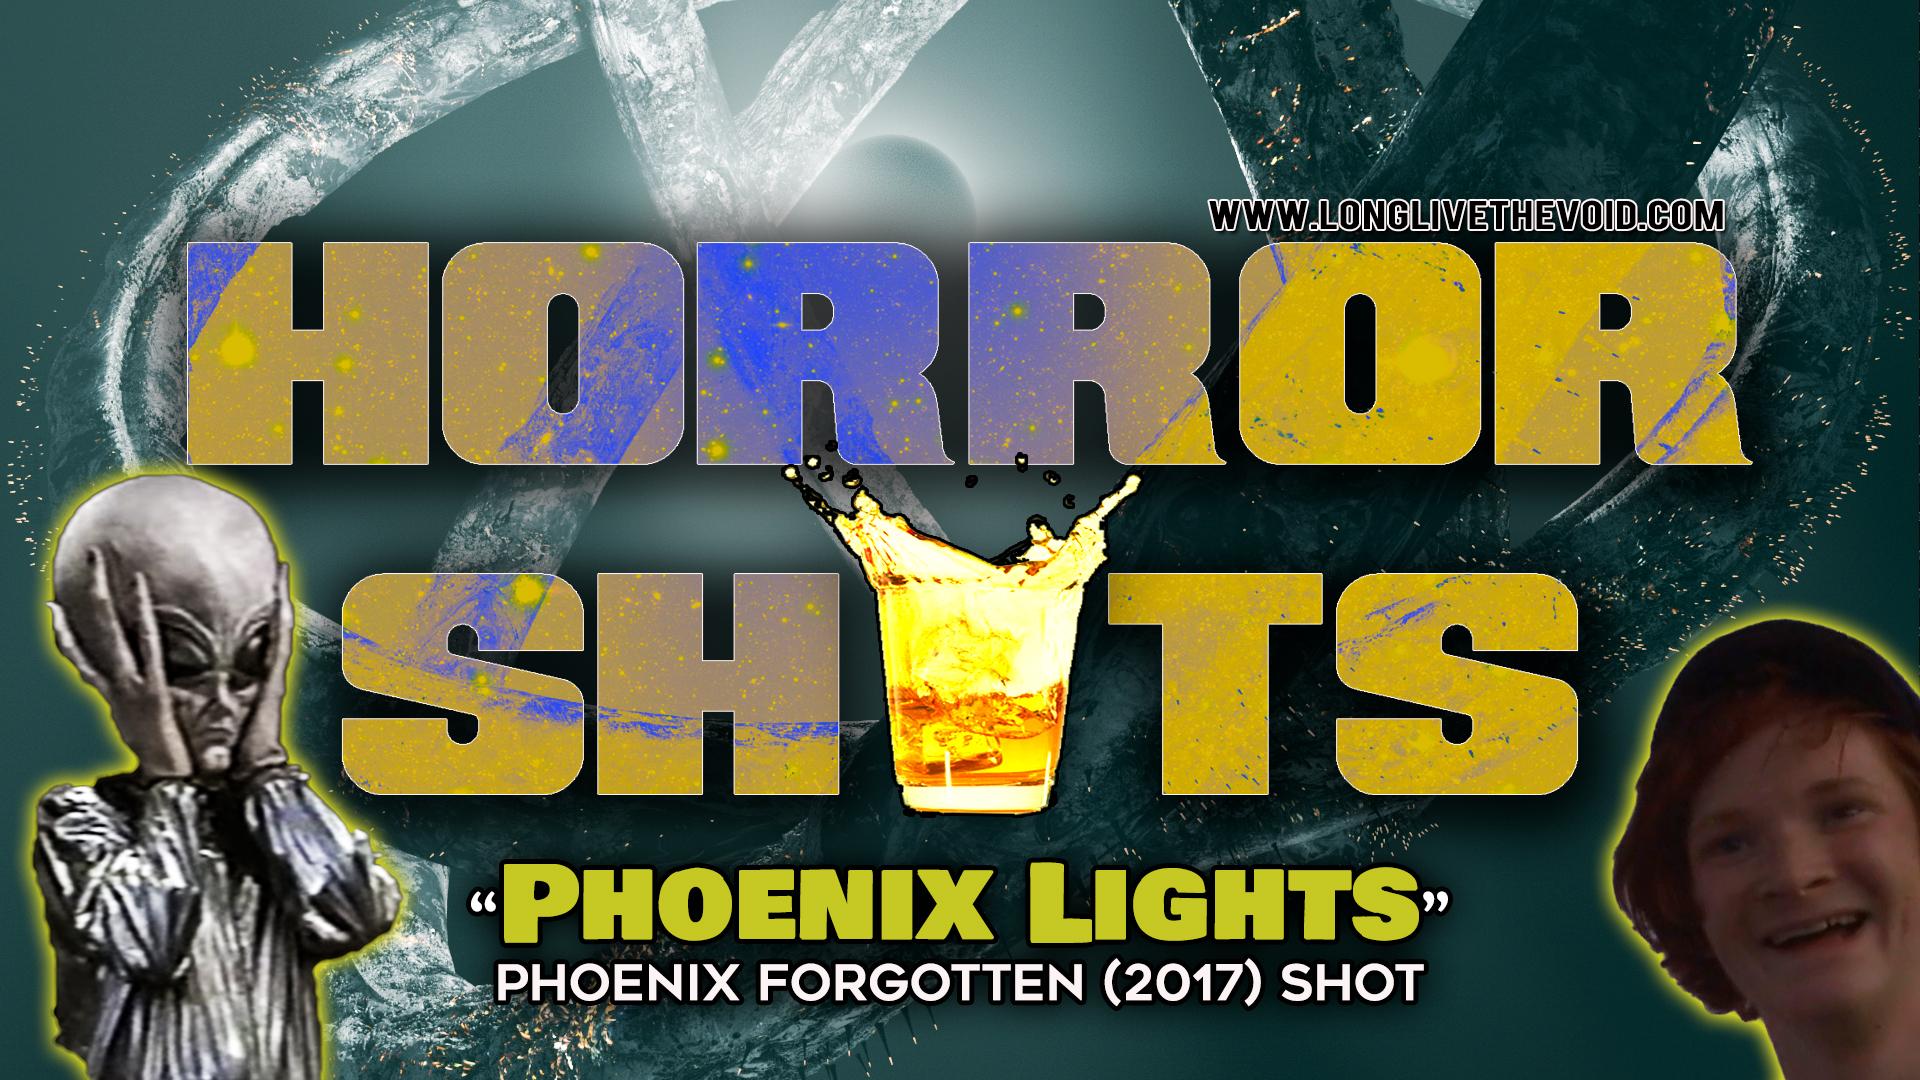 Phoenix-Lights-Phoenix-Forgotten-2017-Shot-HorrorShots.jpg